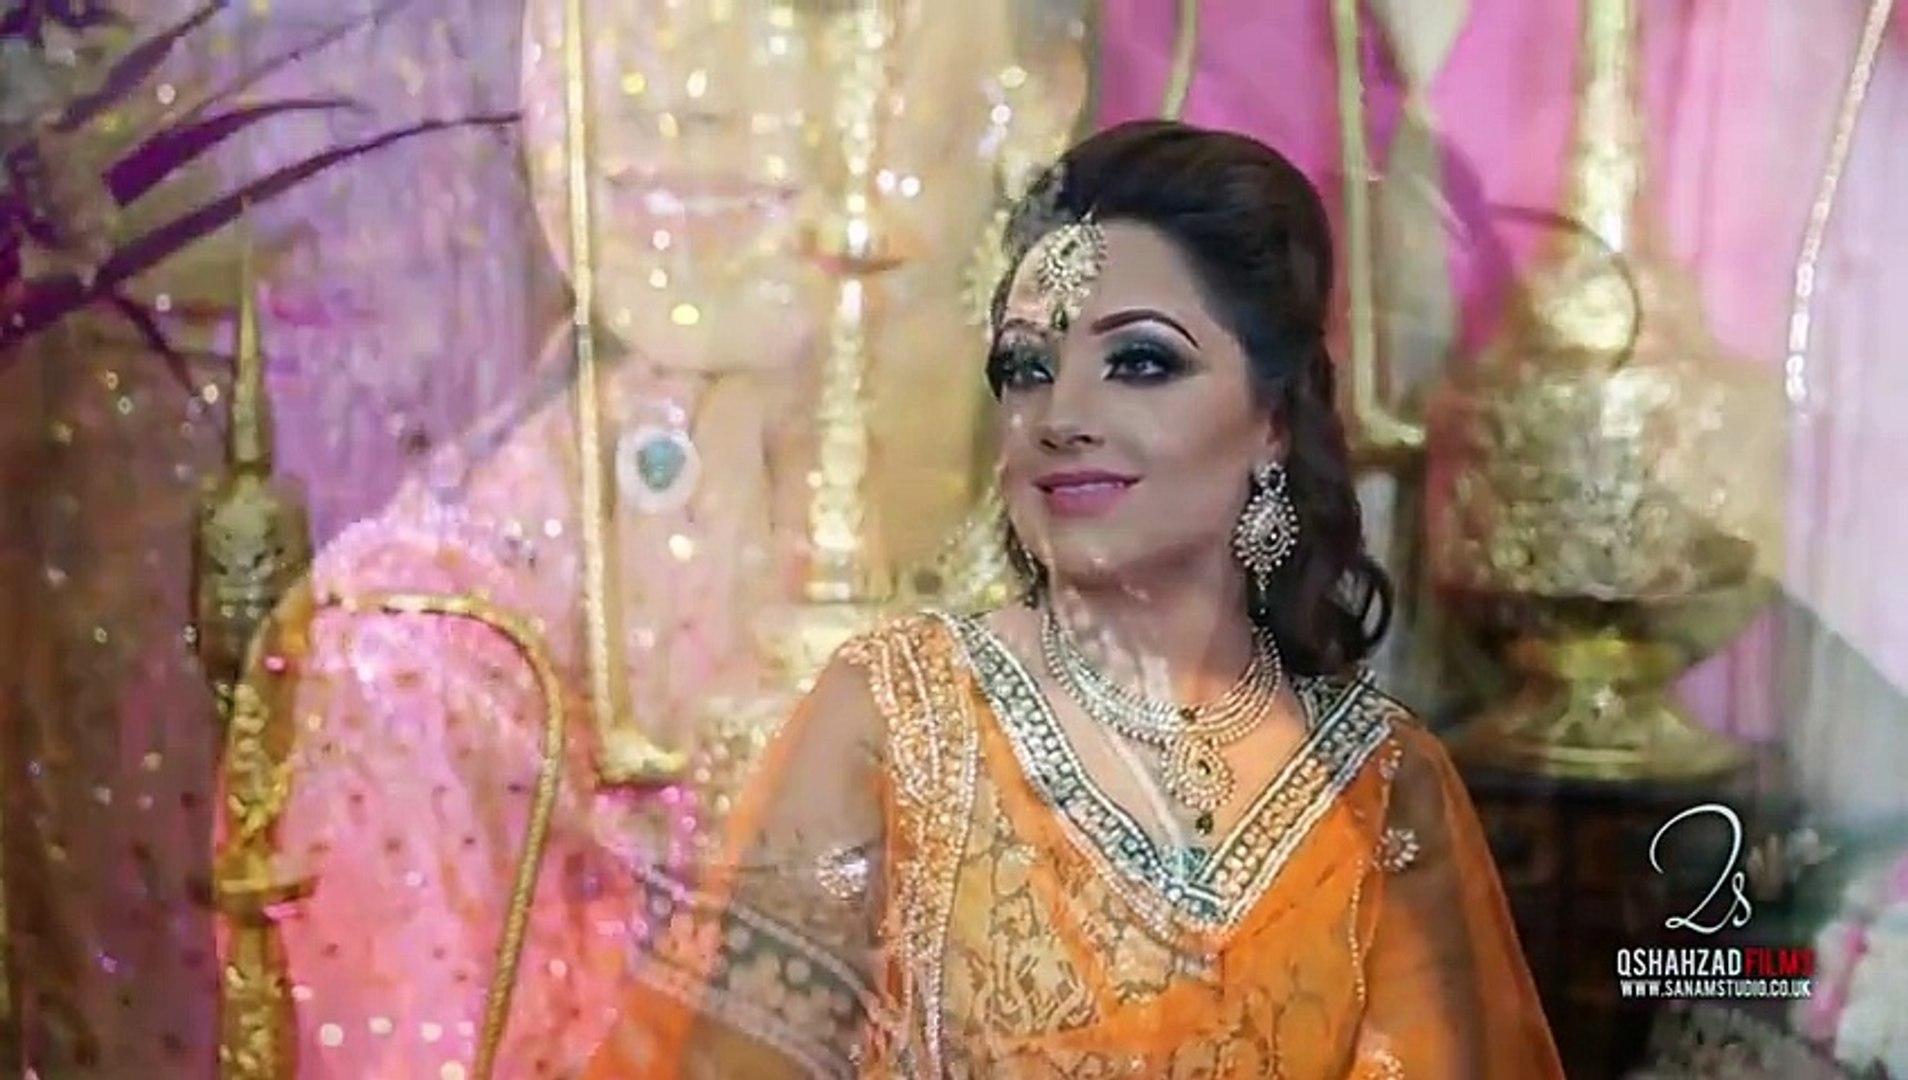 Asian Bridal Makeup - Mehndi Makeup And Hairstyling - Traditional Pakistani Indian Look